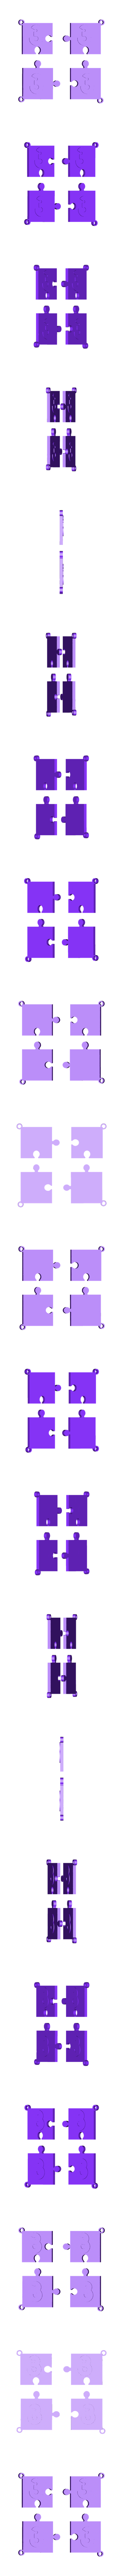 puzzle 3.stl Download STL file puzzle key ring • 3D printing design, catf3d